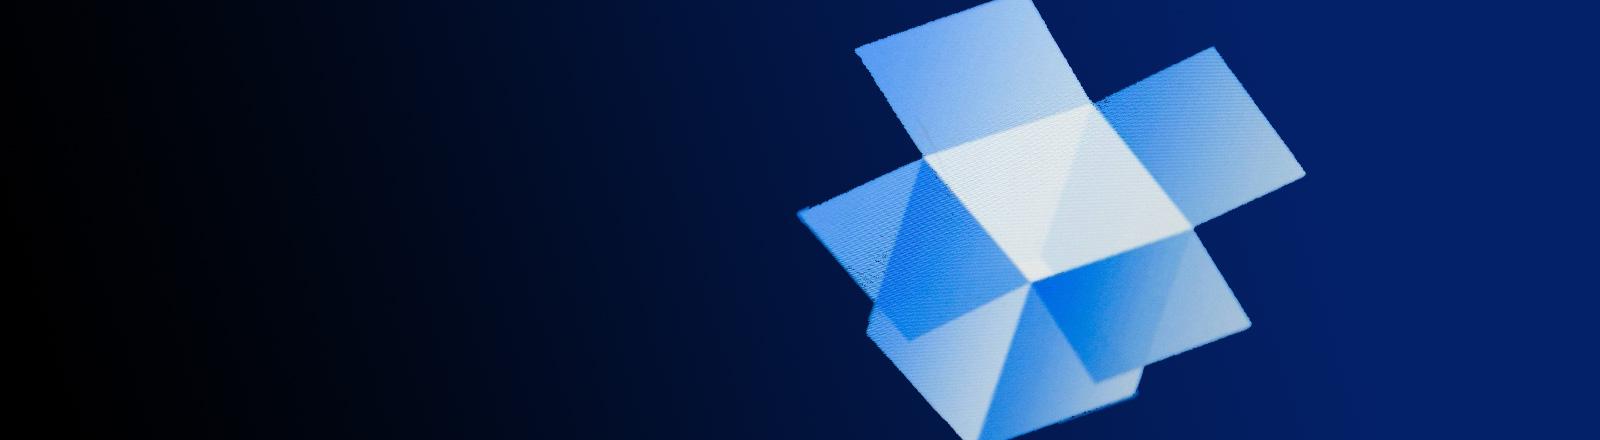 Dropbox Symbolbild